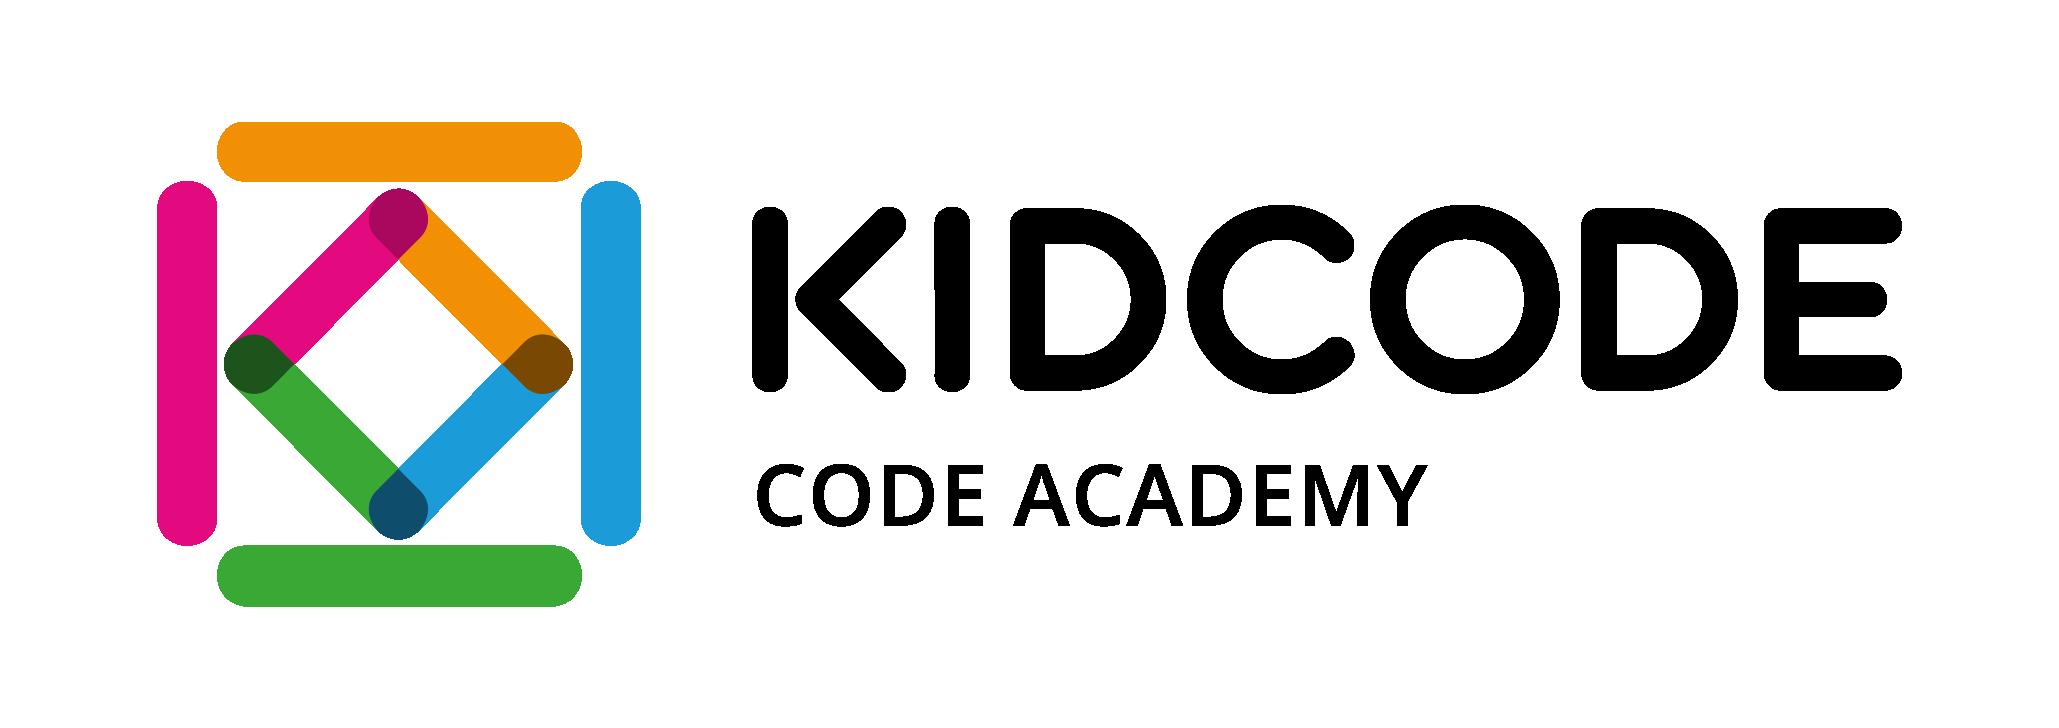 kidcode_logo_baseline_izquierda